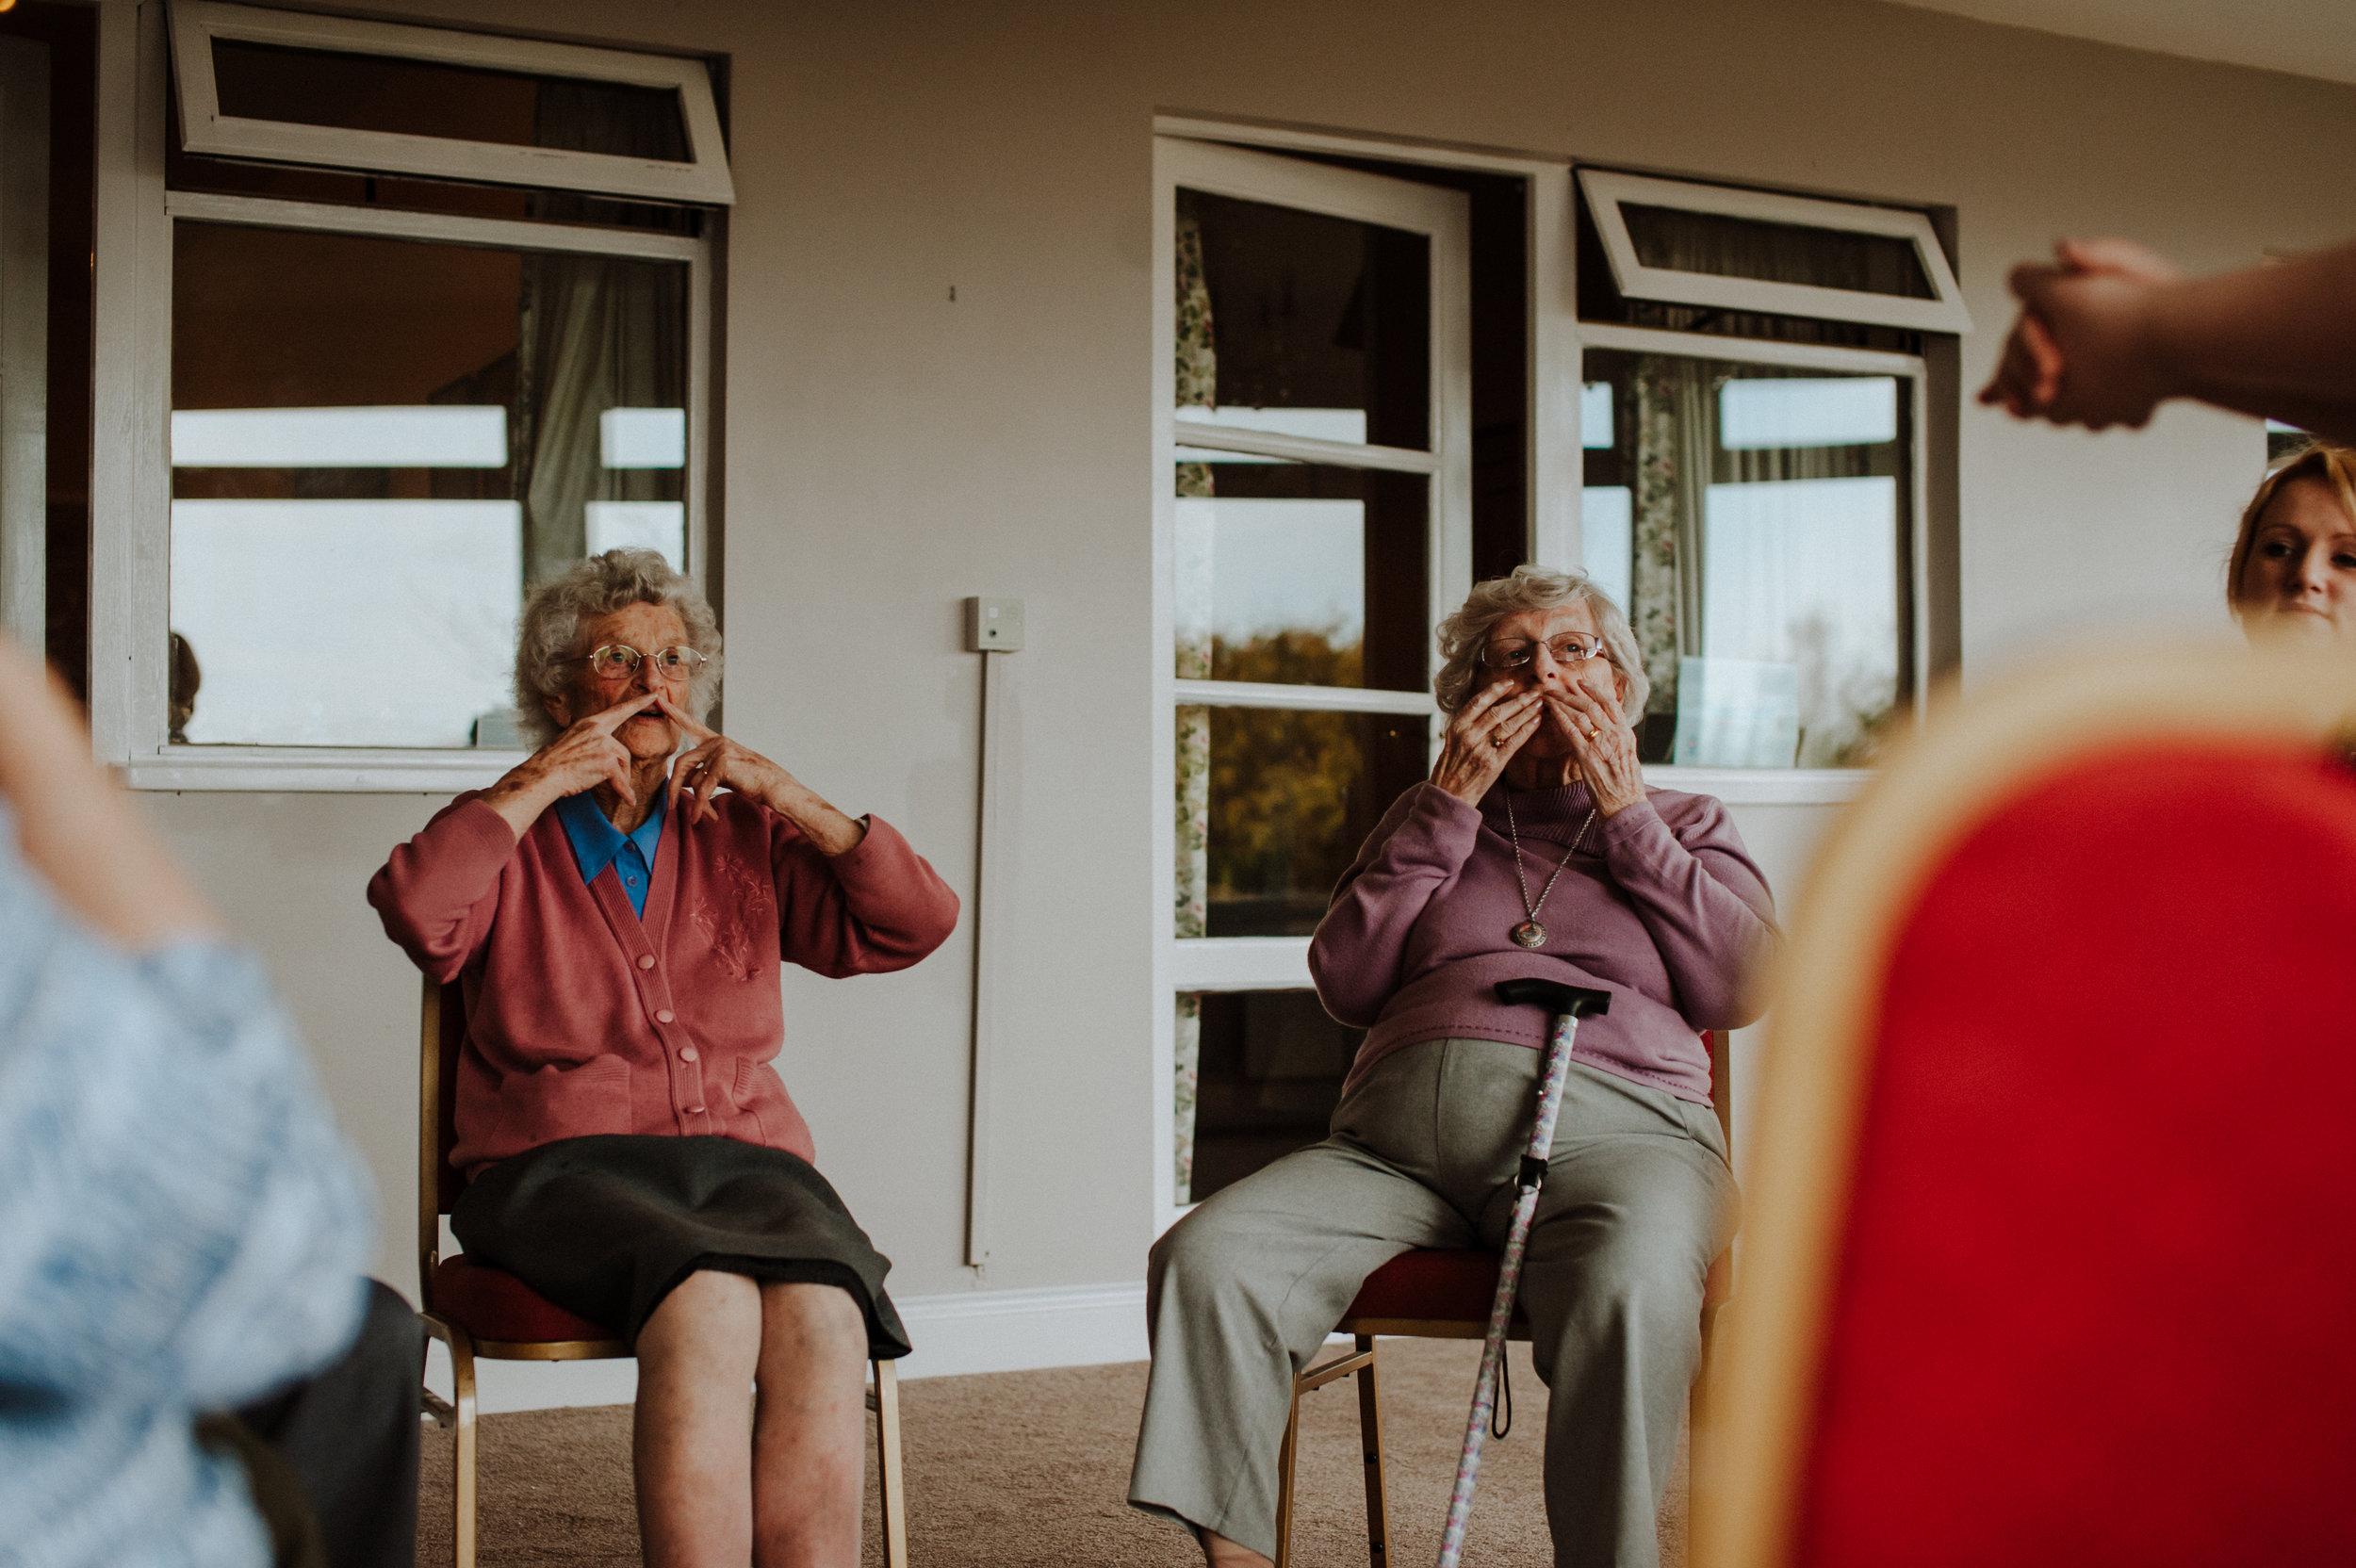 Dementia friendly dance sessions essex